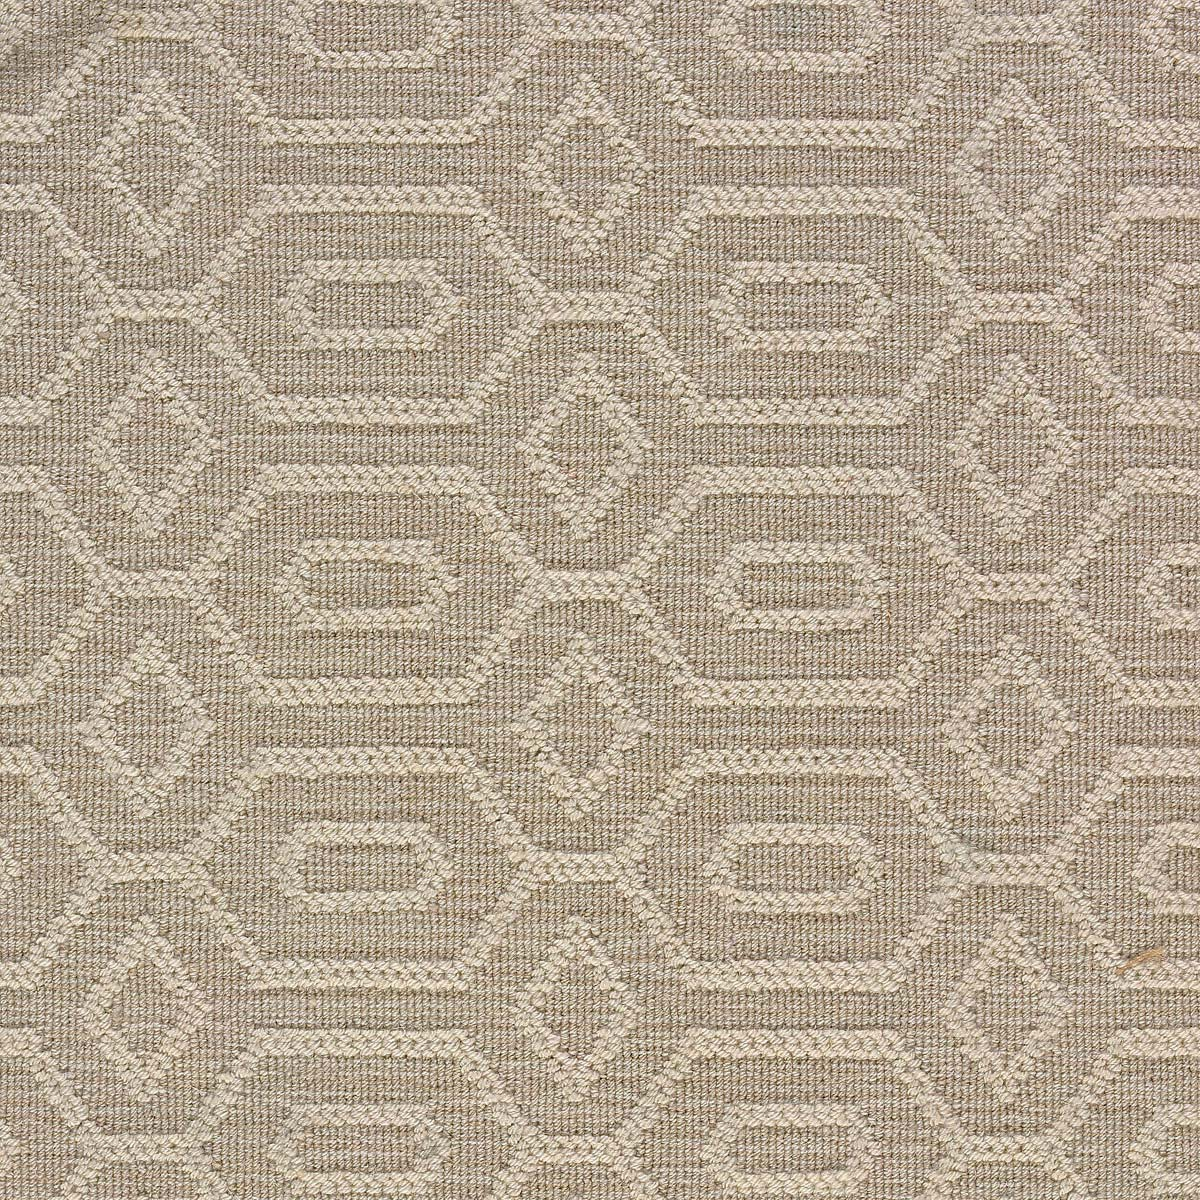 Corgi 2 Geometric Carpets Collection Tim Page